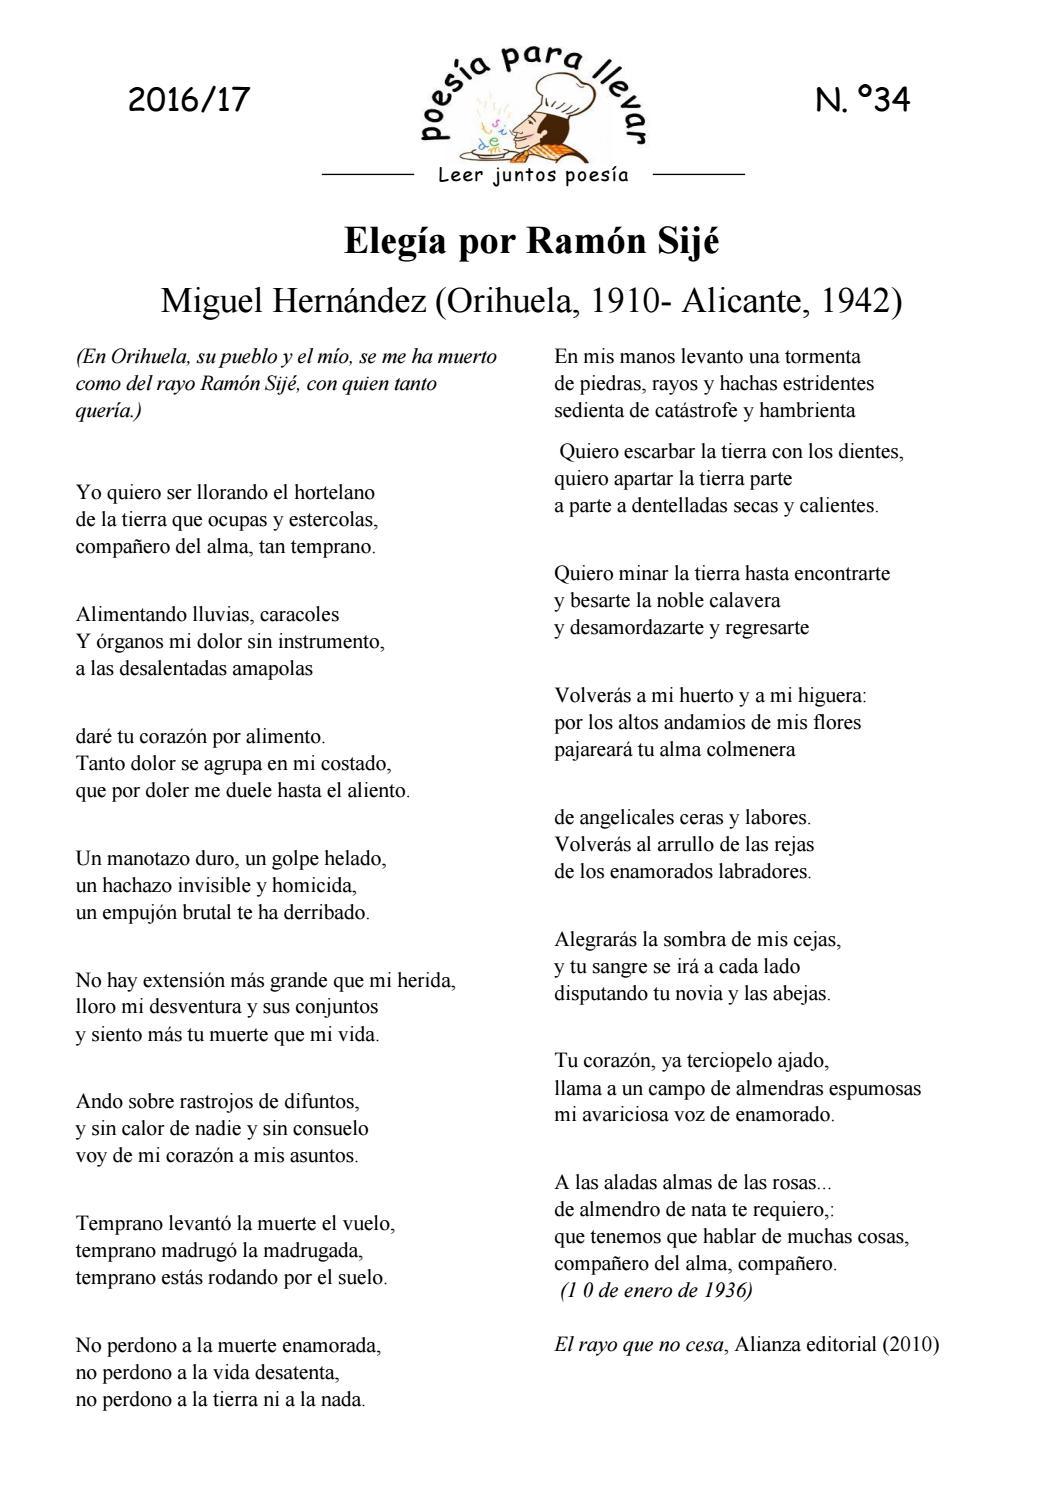 Ppll16 17 Miguel Hernández 34 Elegía Por Ramón Sijé By Isabel Martin Issuu